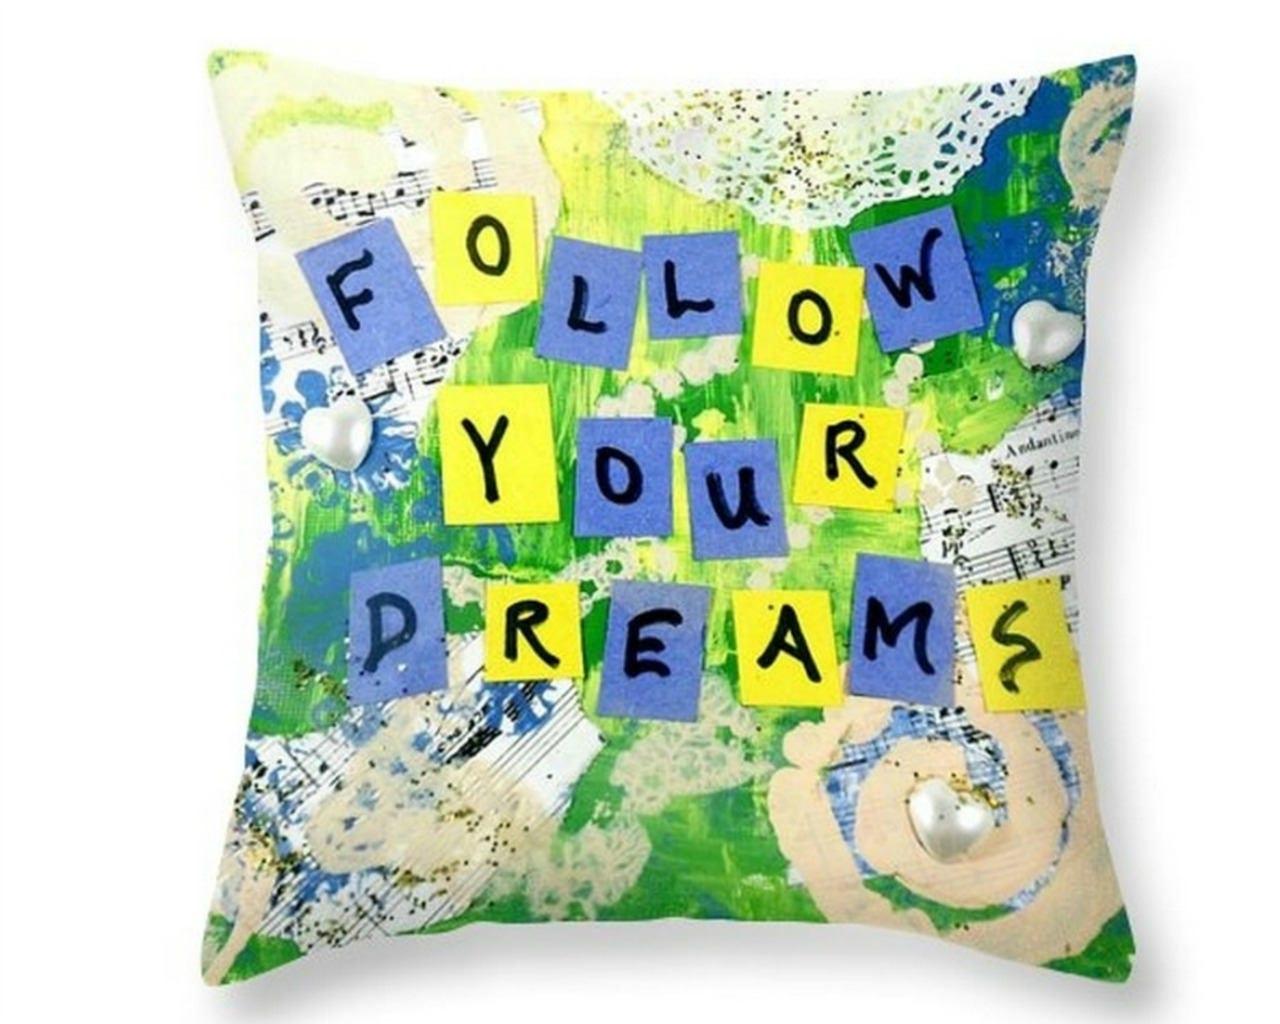 Follow Your Dreams Pillow W Words, Fine Art Accent Pillows, Inspirational  Pillow Cover,